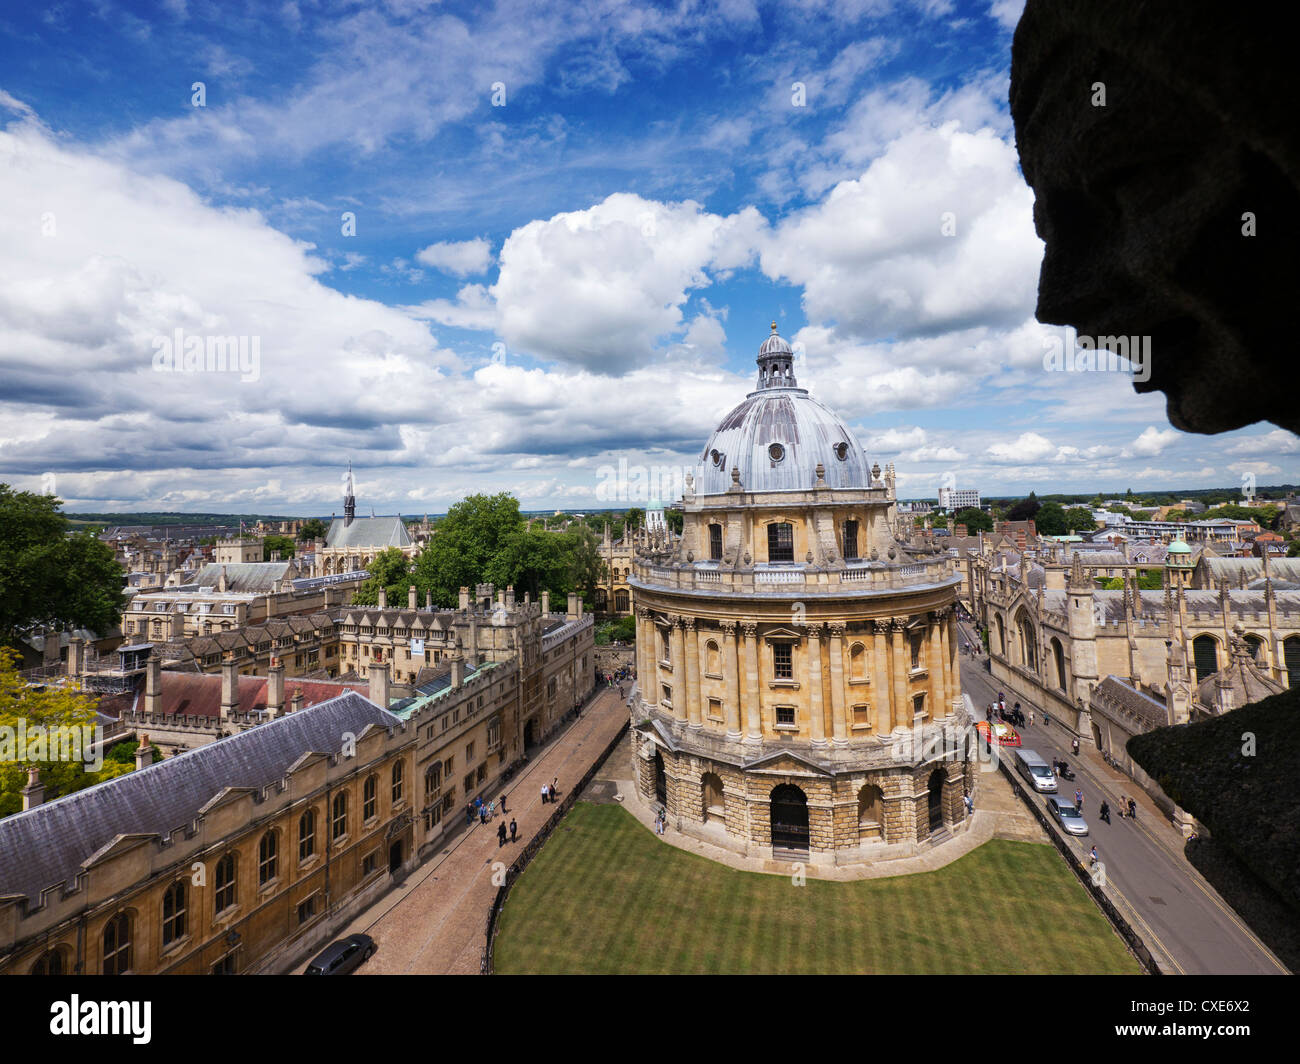 Erhöhten Blick auf Radcliffe Camera, Oxford, Oxfordshire, England, UK Stockbild